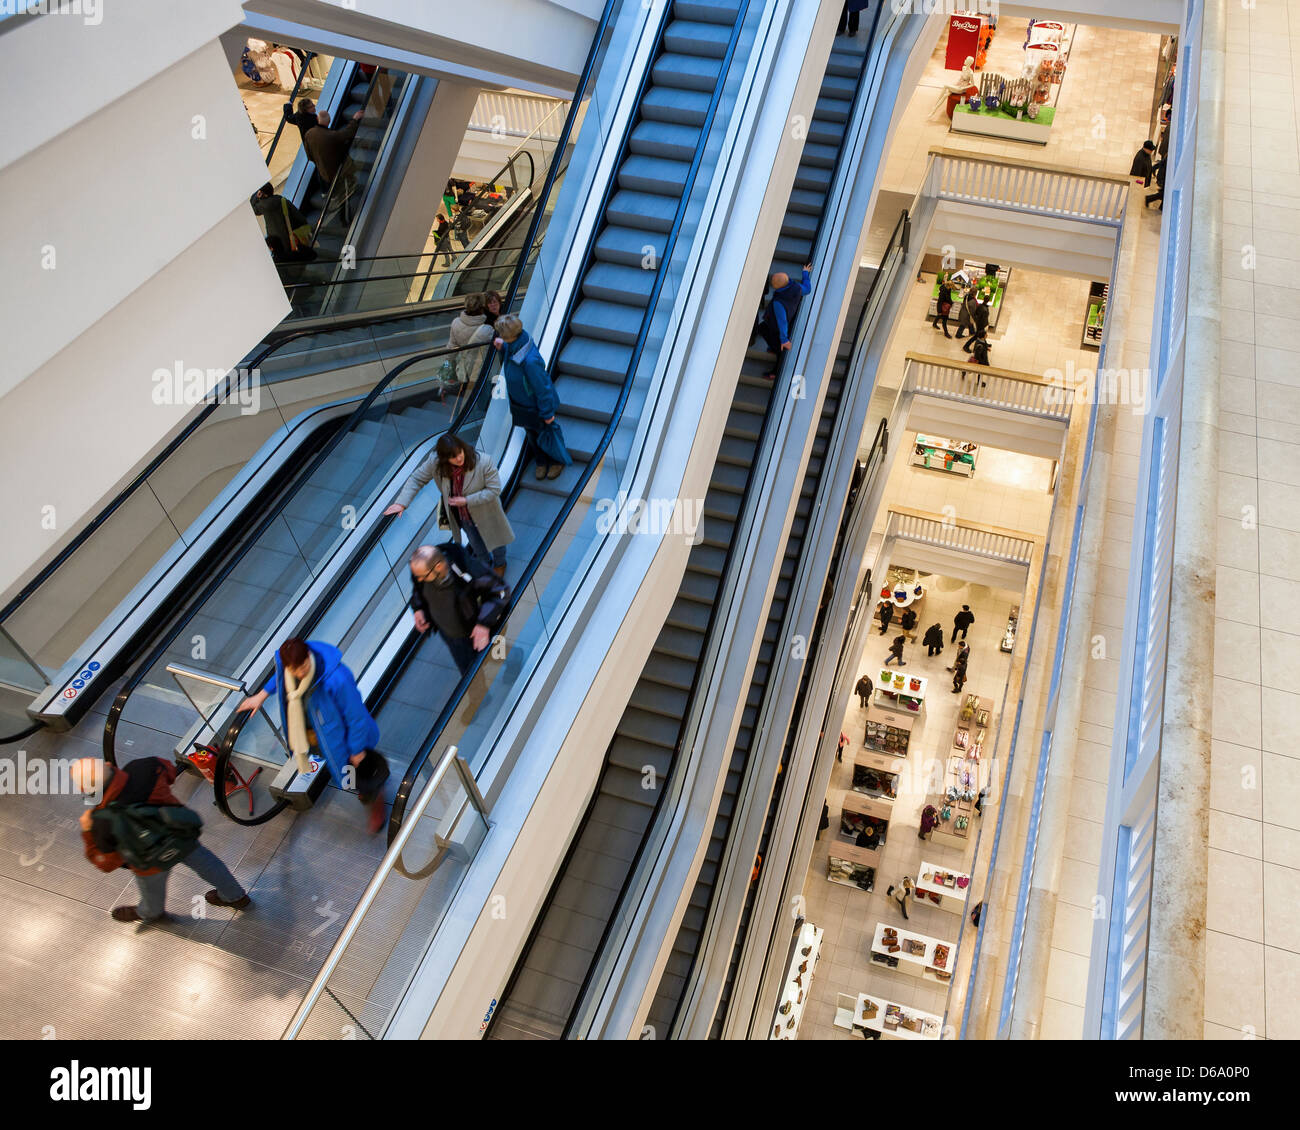 Galeria Kaufhof: Store Escalators Stock Photos & Store Escalators Stock